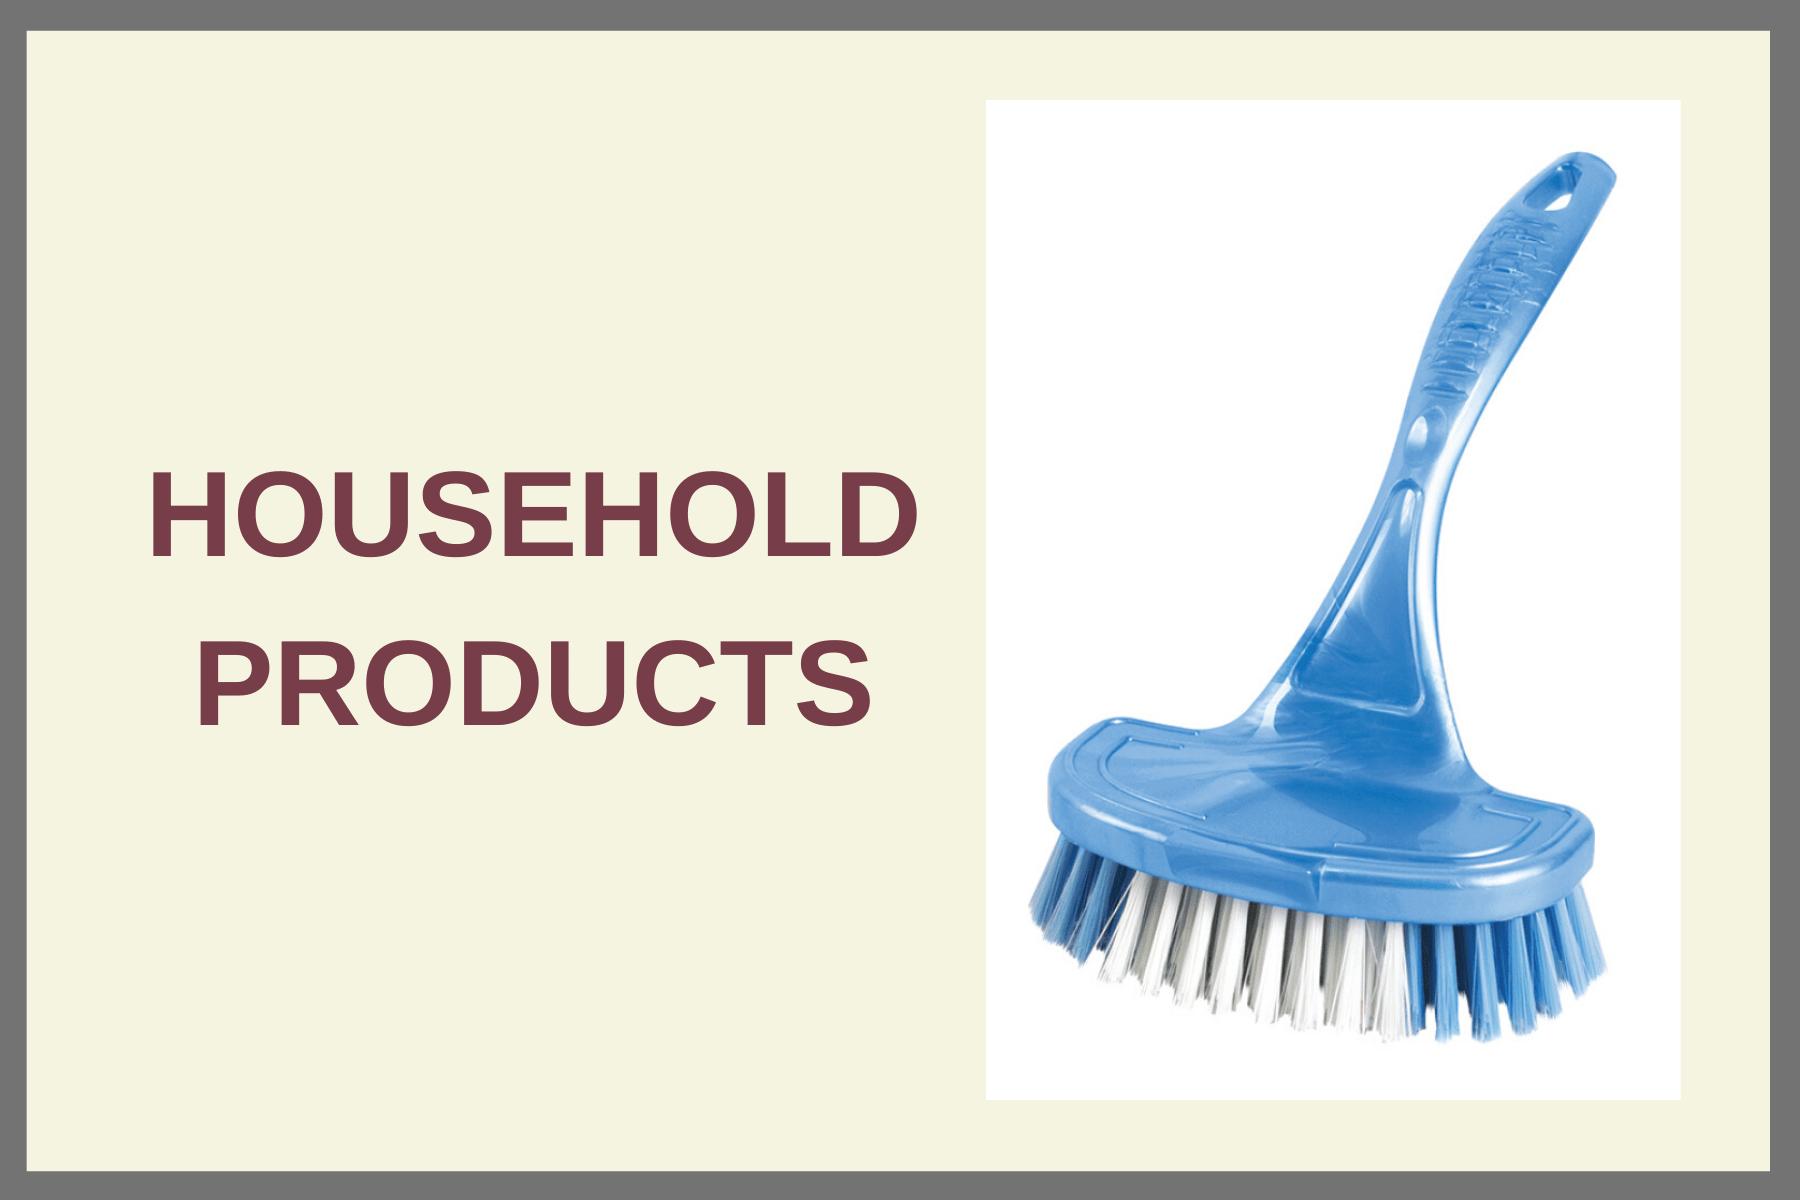 household products product cleaning dishwash washing care house home brush brushes mop set